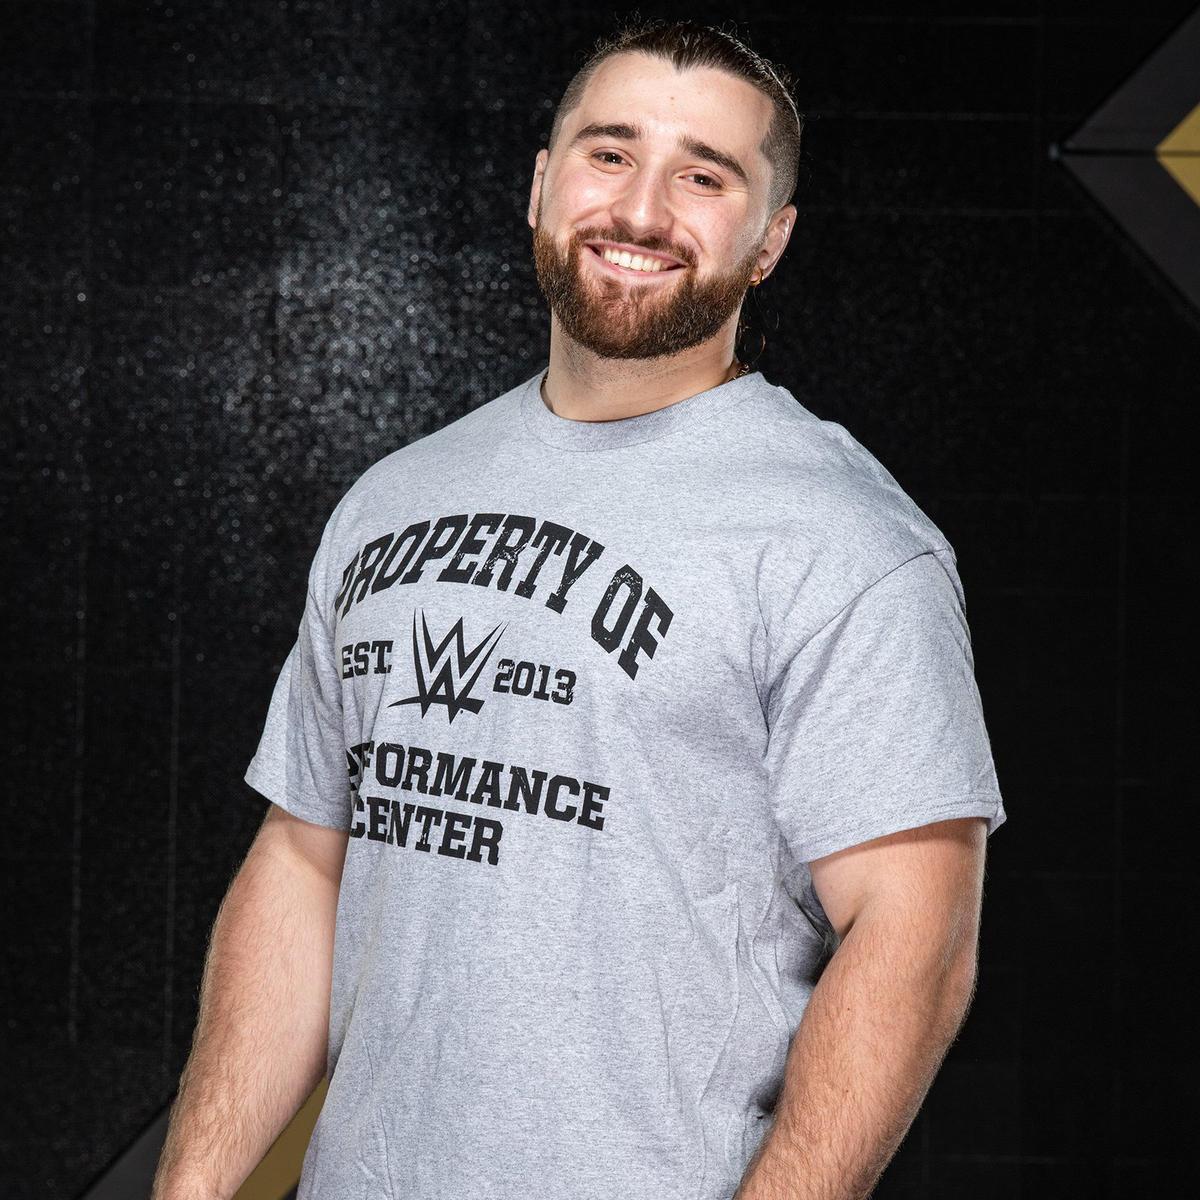 Joe Ariola is a 25-year-old amateur wrestler from Oak Park, Illinois.